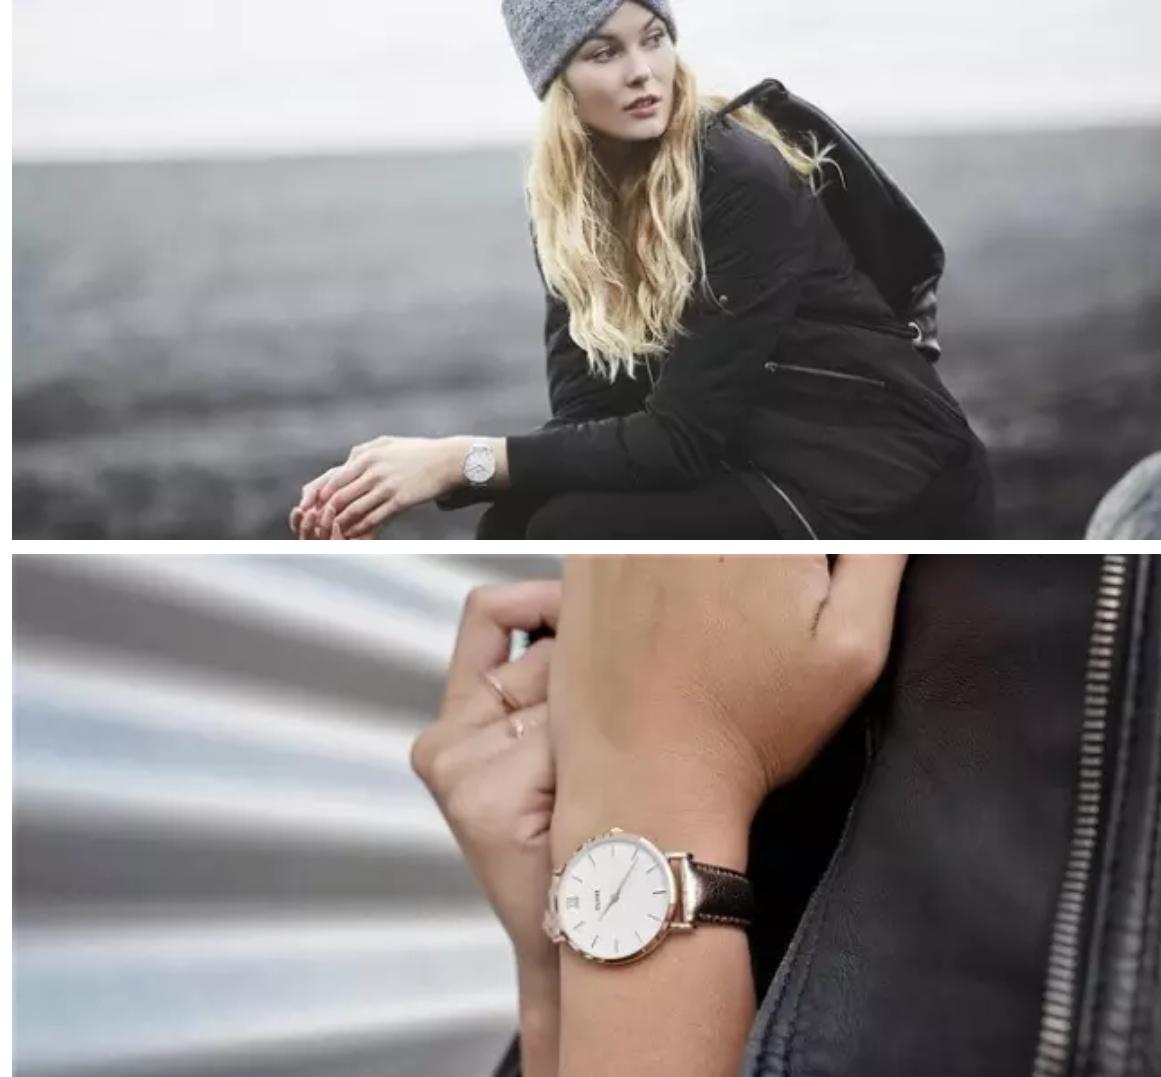 Cluse荷兰小众手表品牌8折咯!ins上最具人气手表